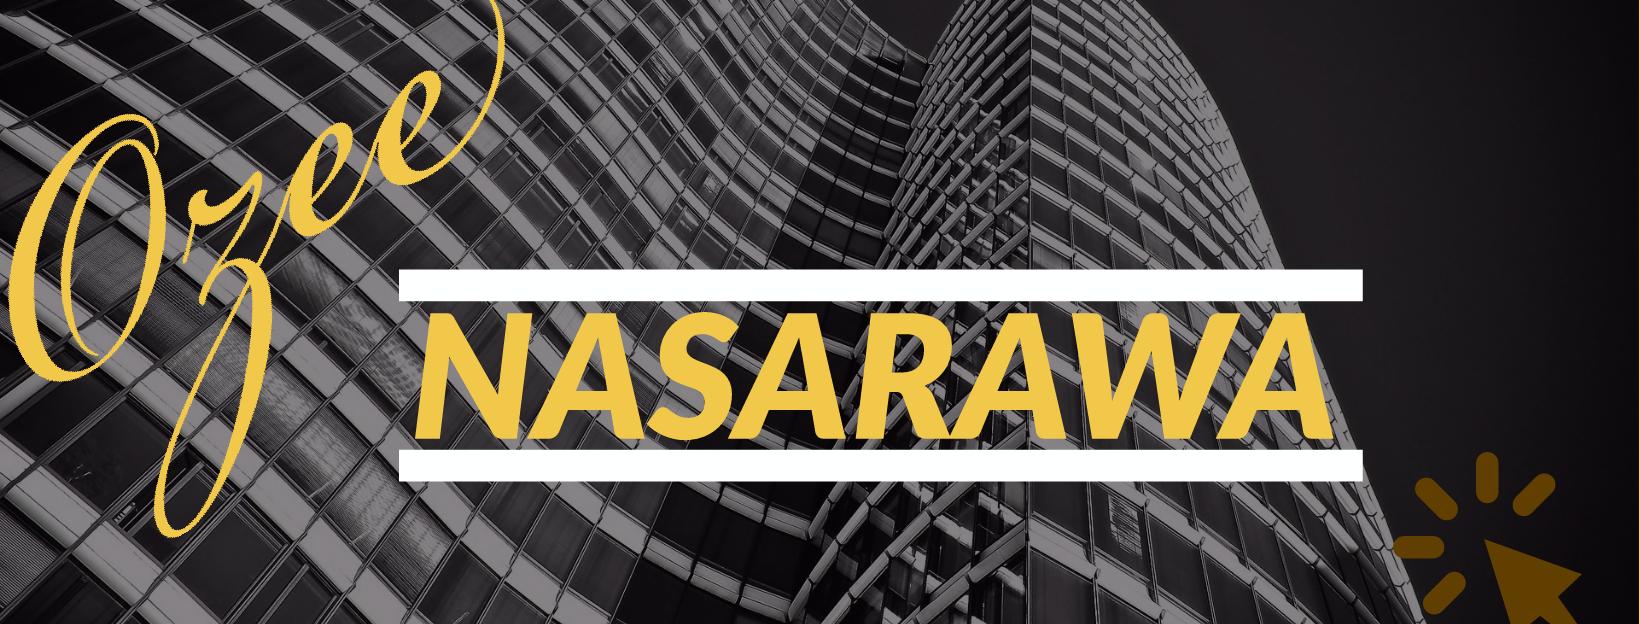 Nasarawa by Ozee